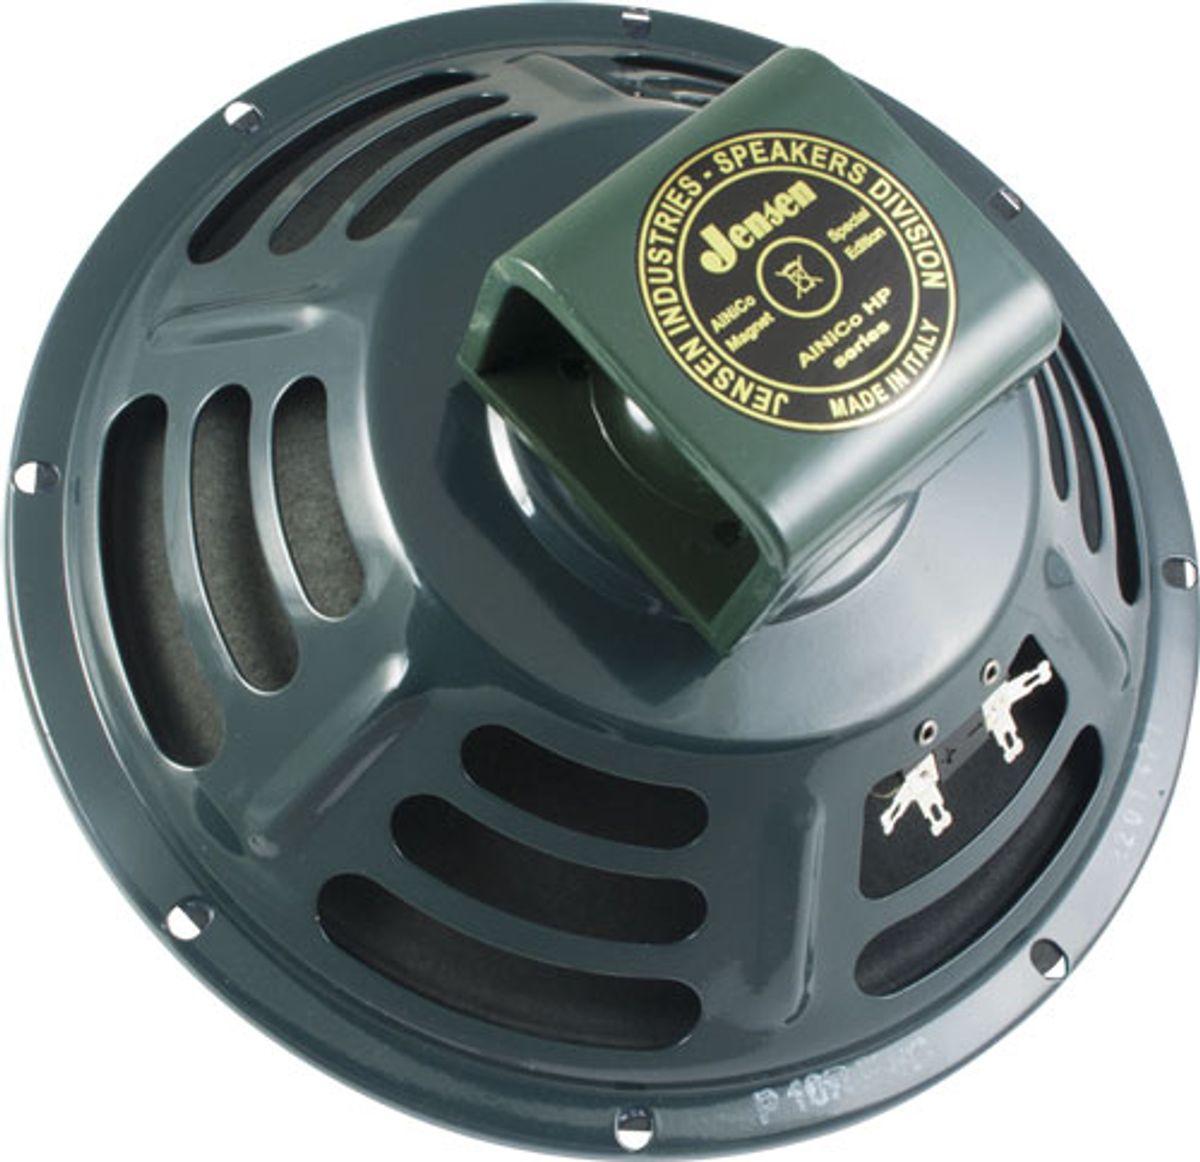 Jensen Speakers Releases the P10R-F